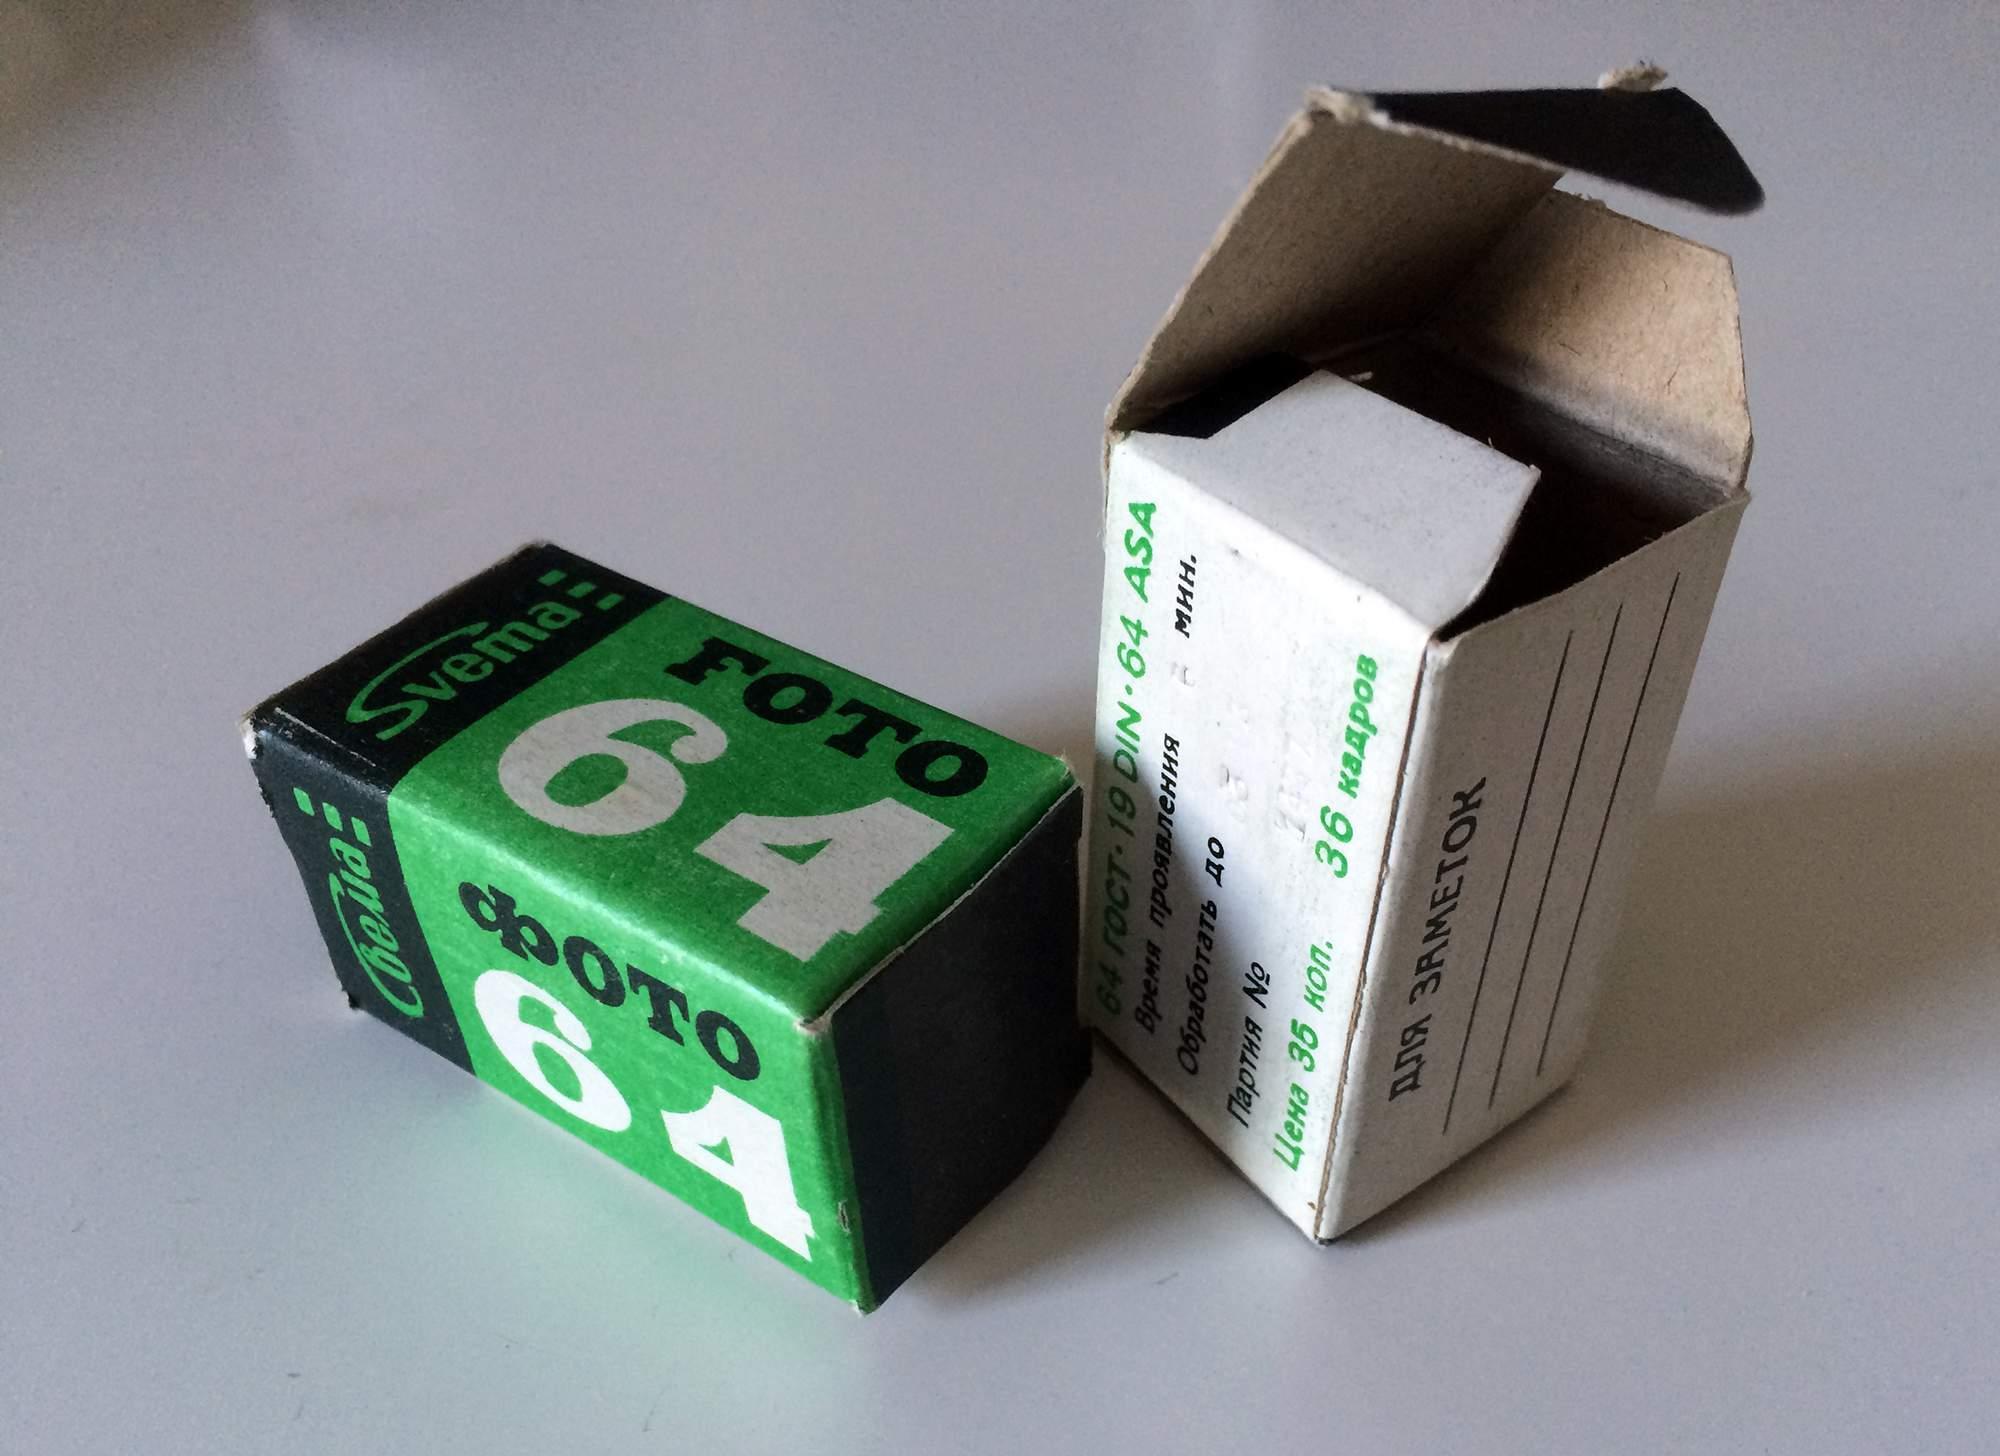 Svema 35mm film box